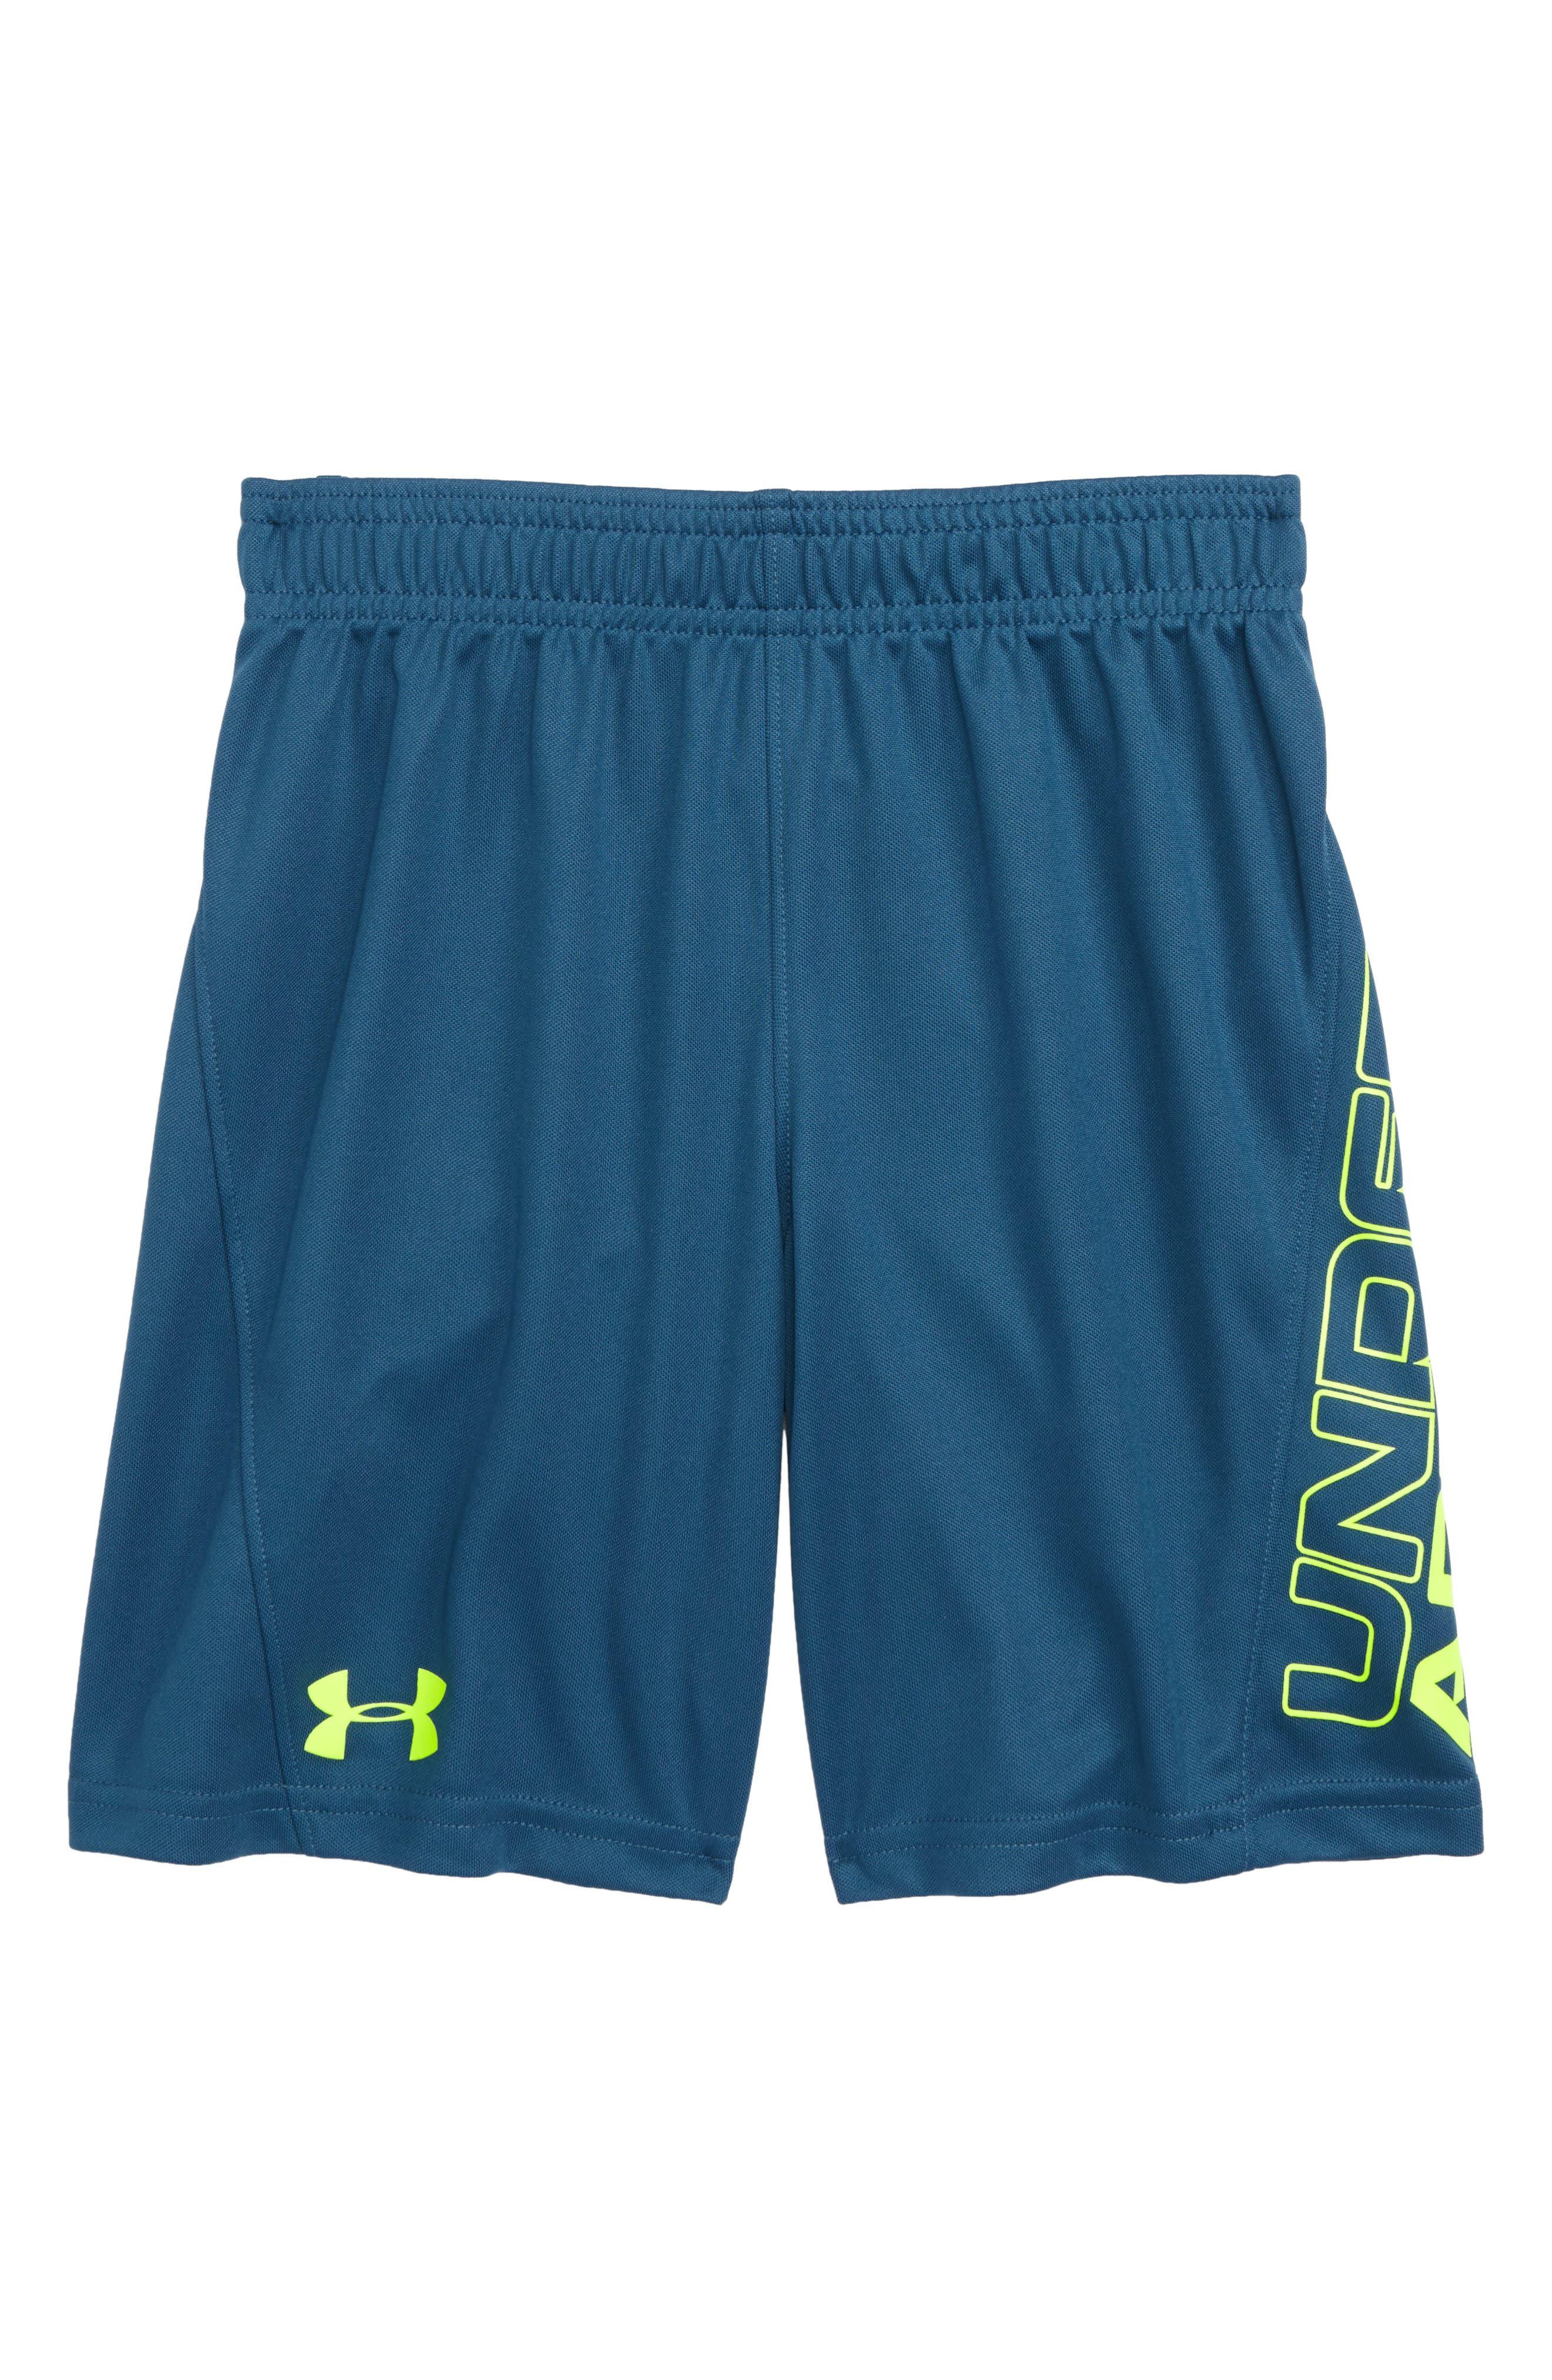 UNDER ARMOUR Kick Off HeatGear<sup>®</sup> Athletic Shorts, Main, color, PETROL BLUE